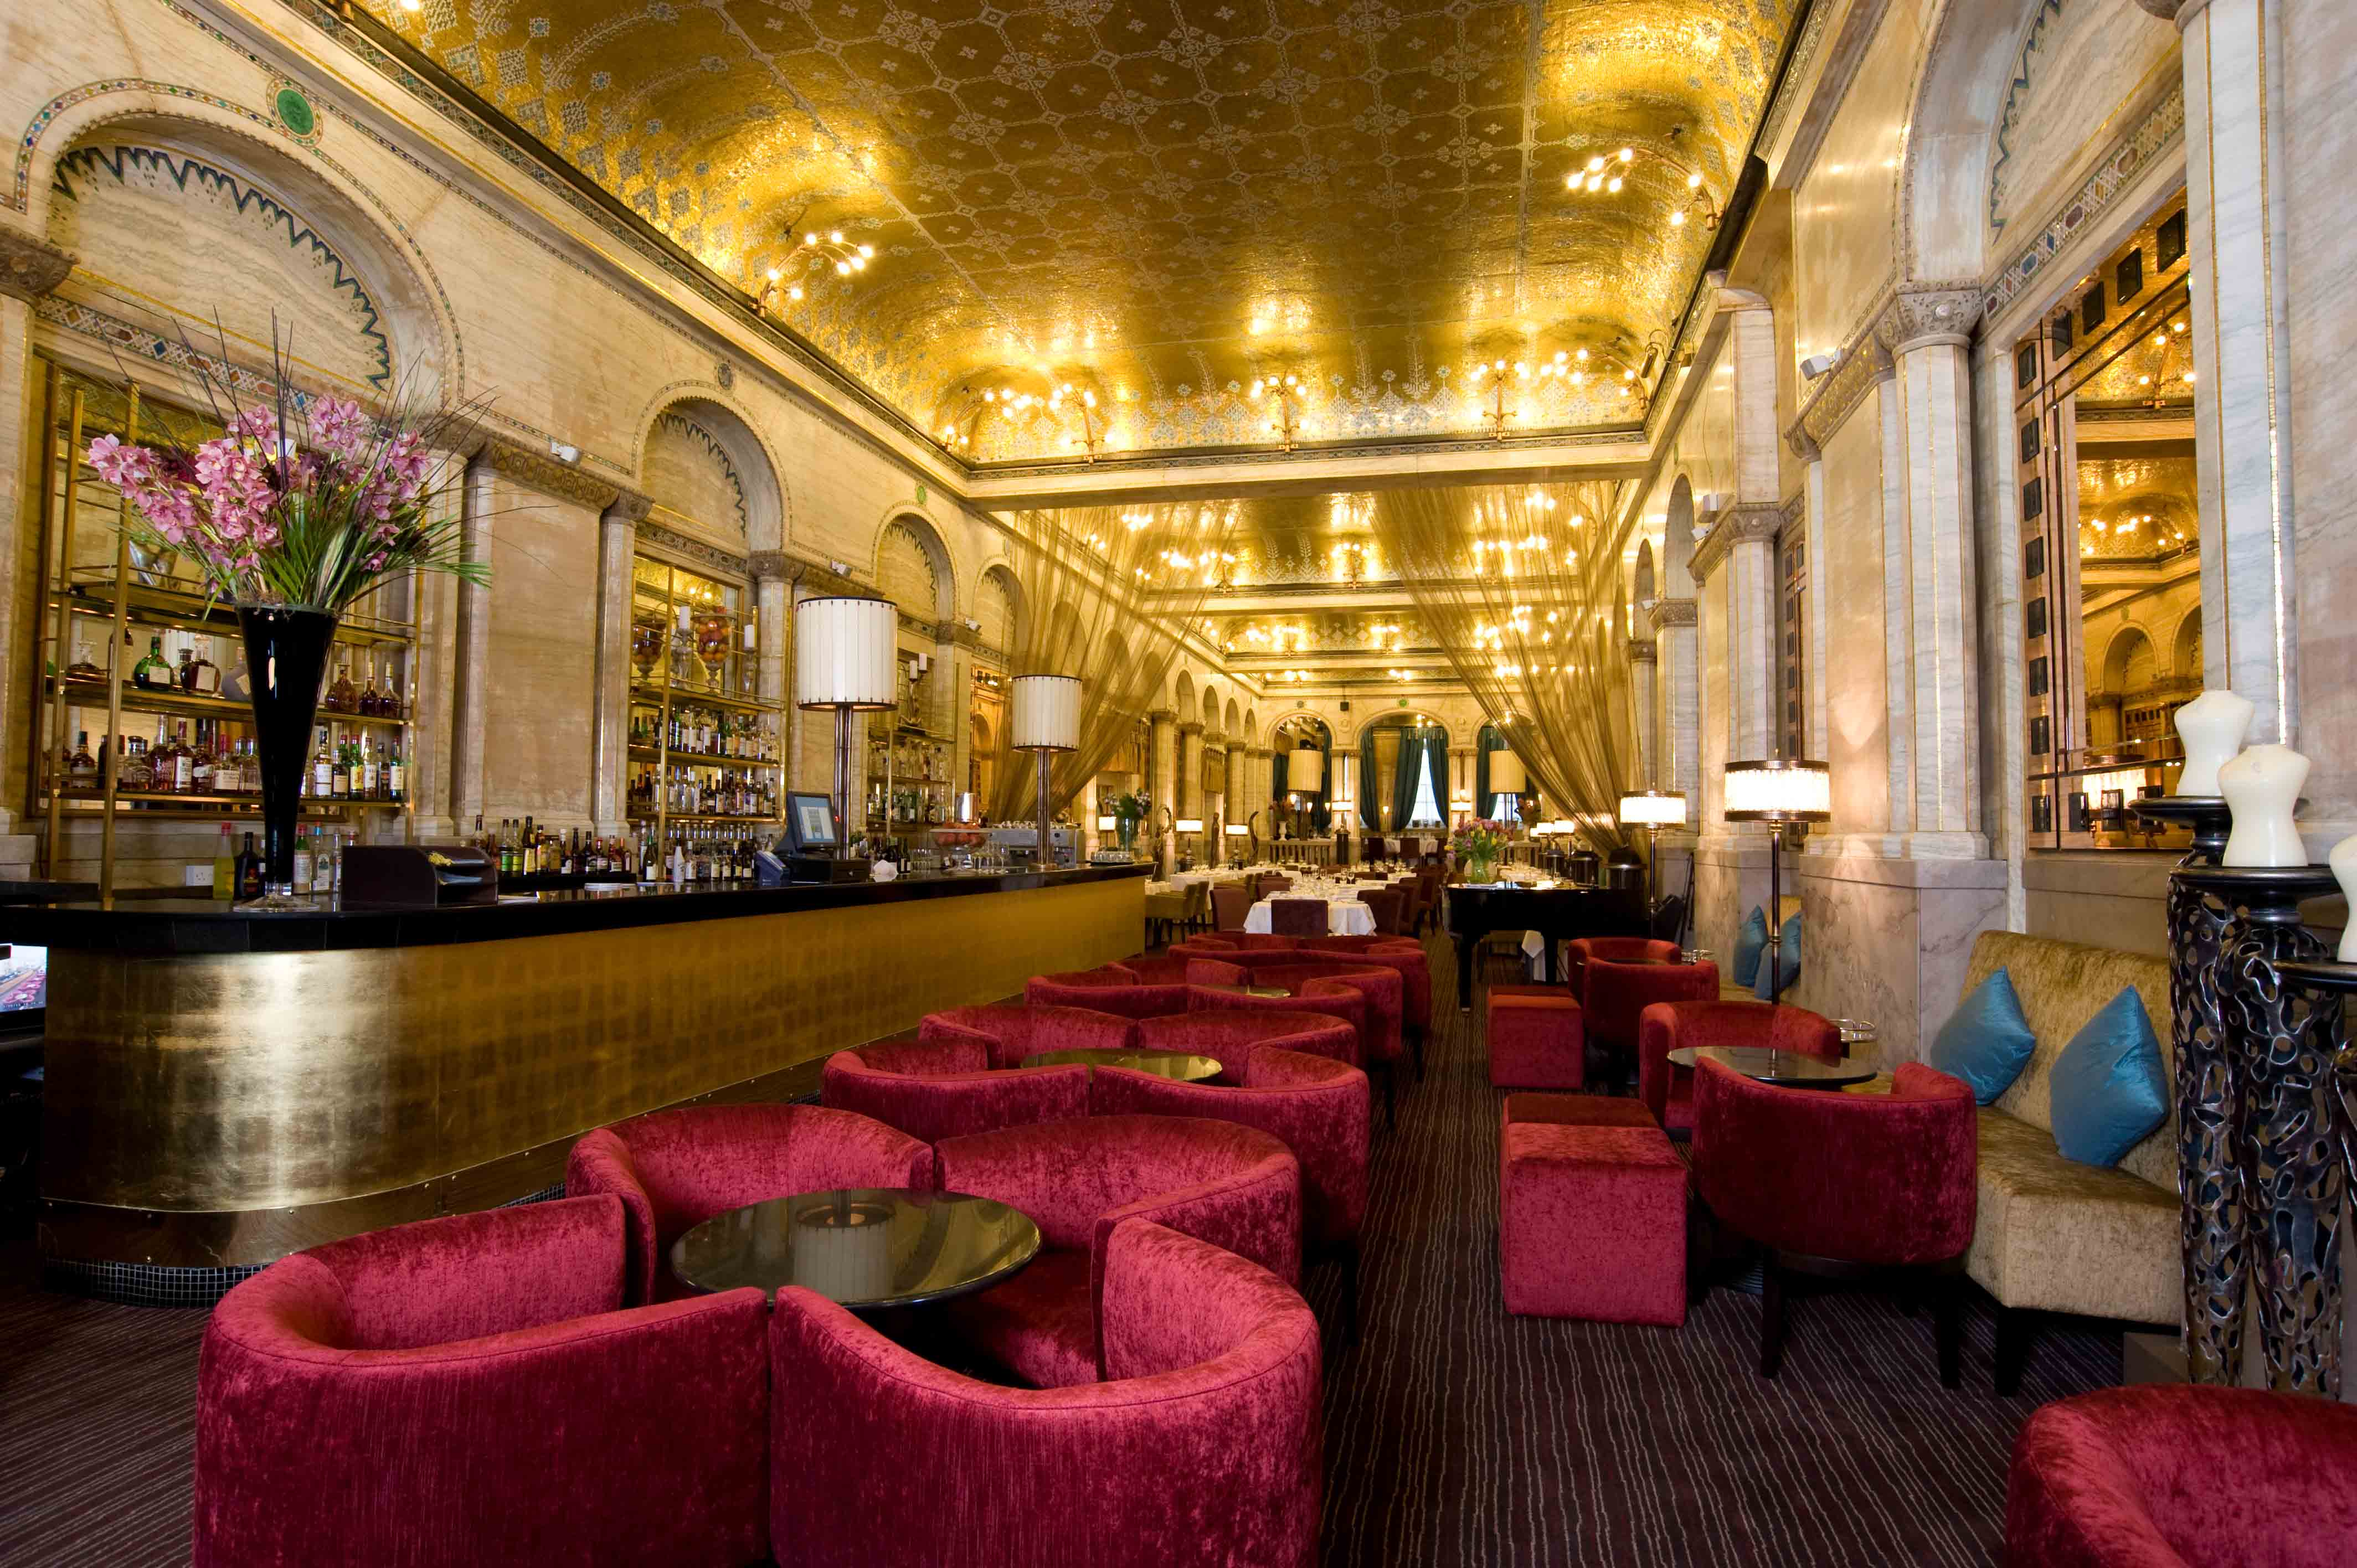 Theatre Themed Restaurant London